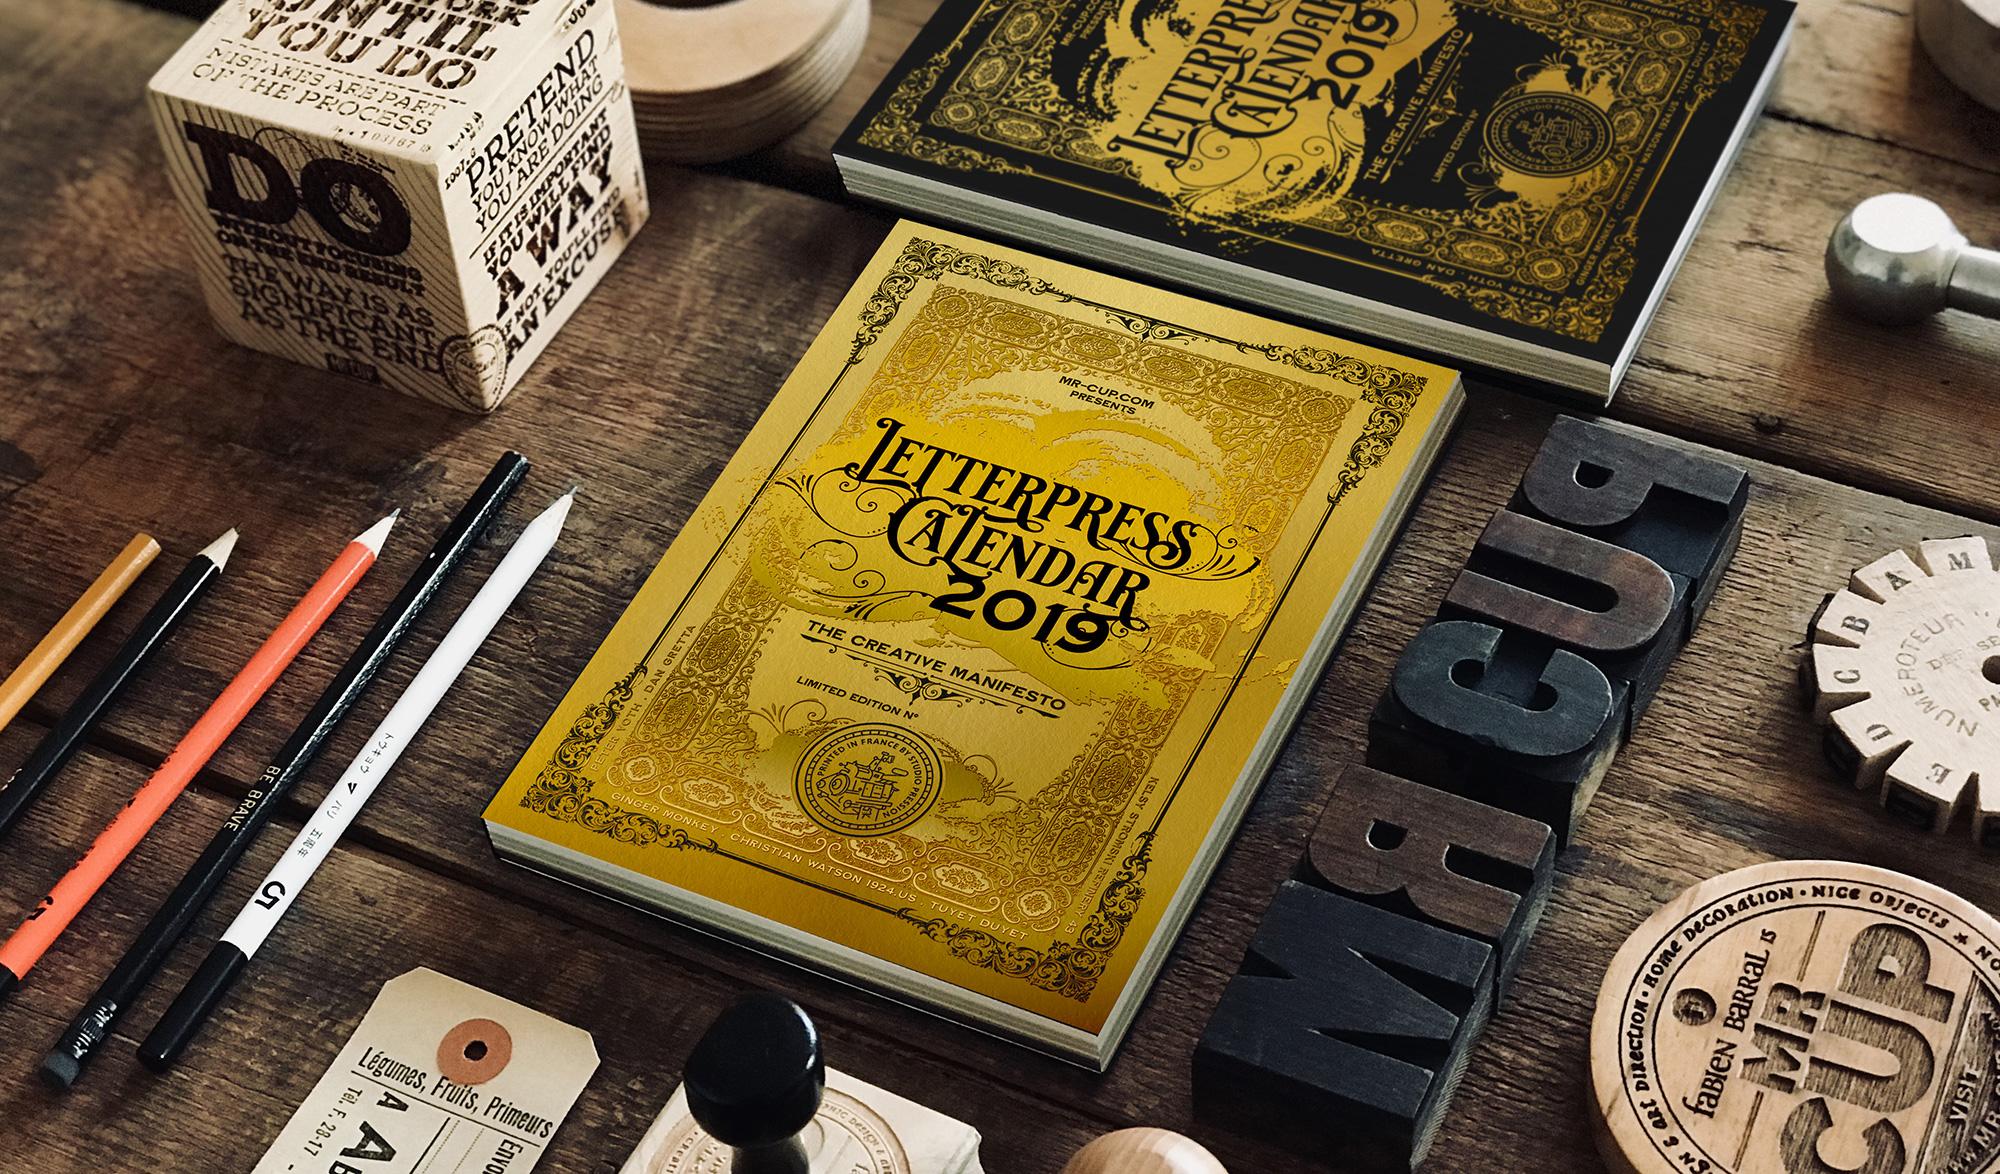 Letterpress calendar Adobe